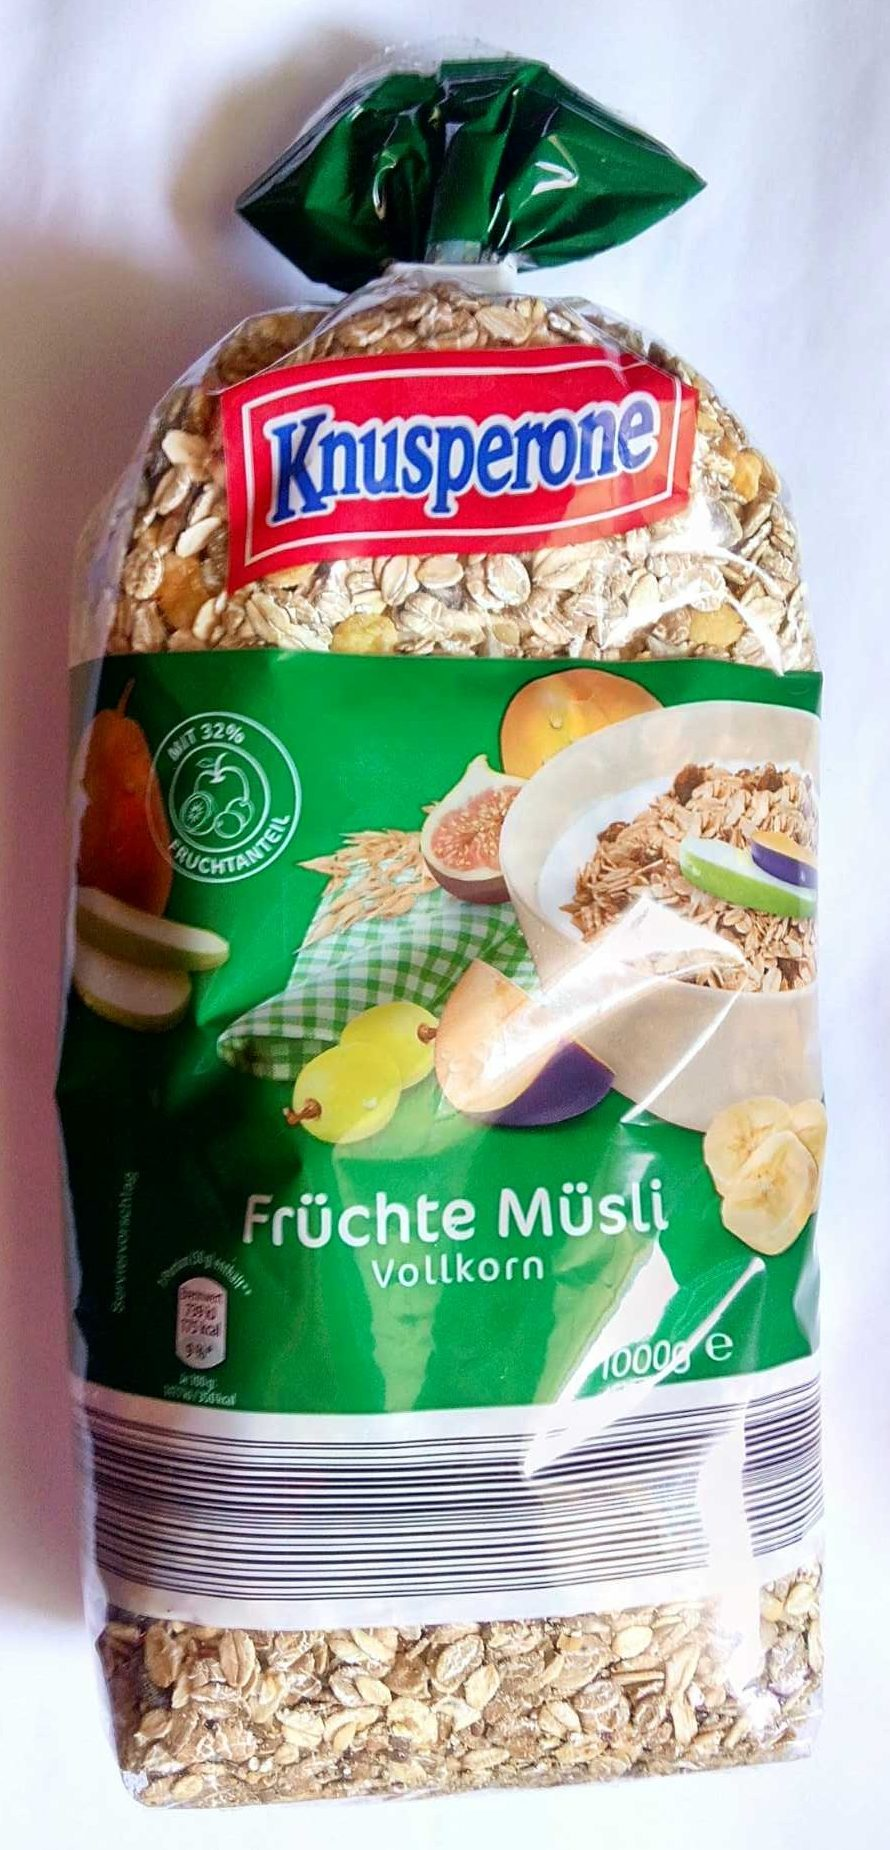 Früchtemüsli Vollkorn/Trauben-Nuss Müsli Vollkorn - Produit